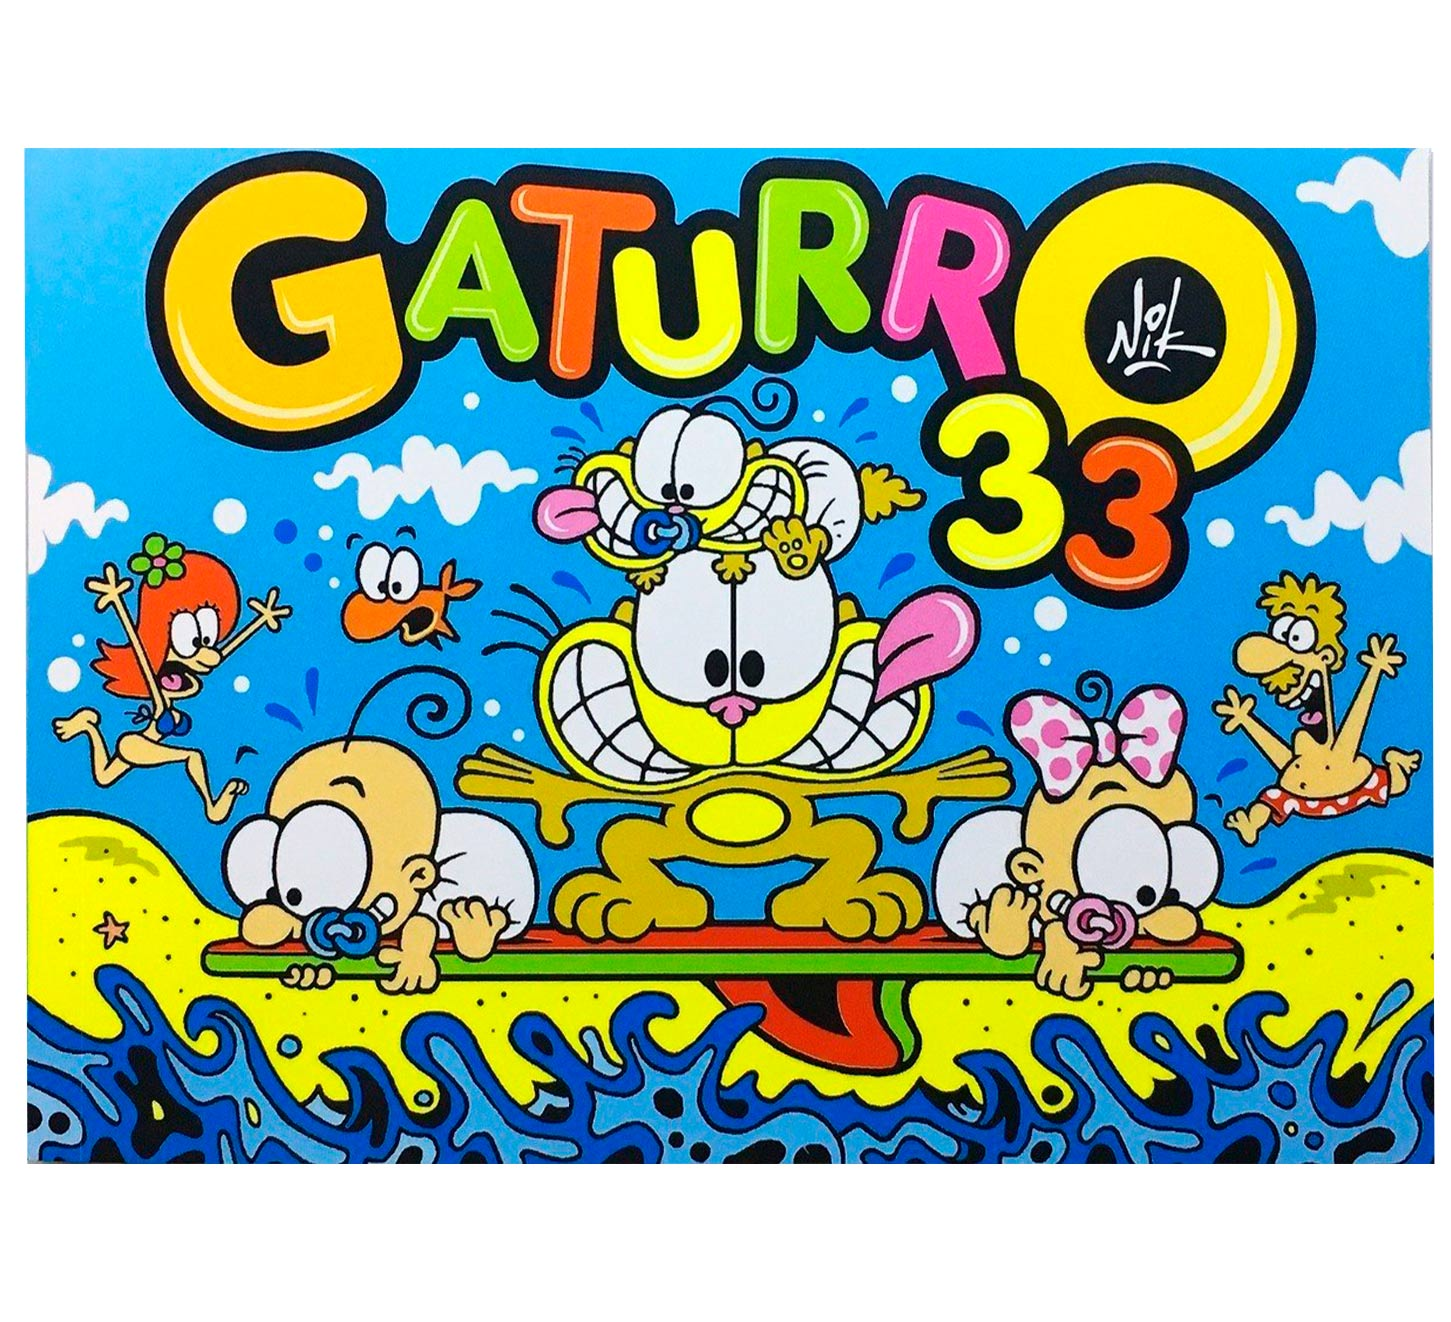 GATURRO 33 SUDAMERICANA